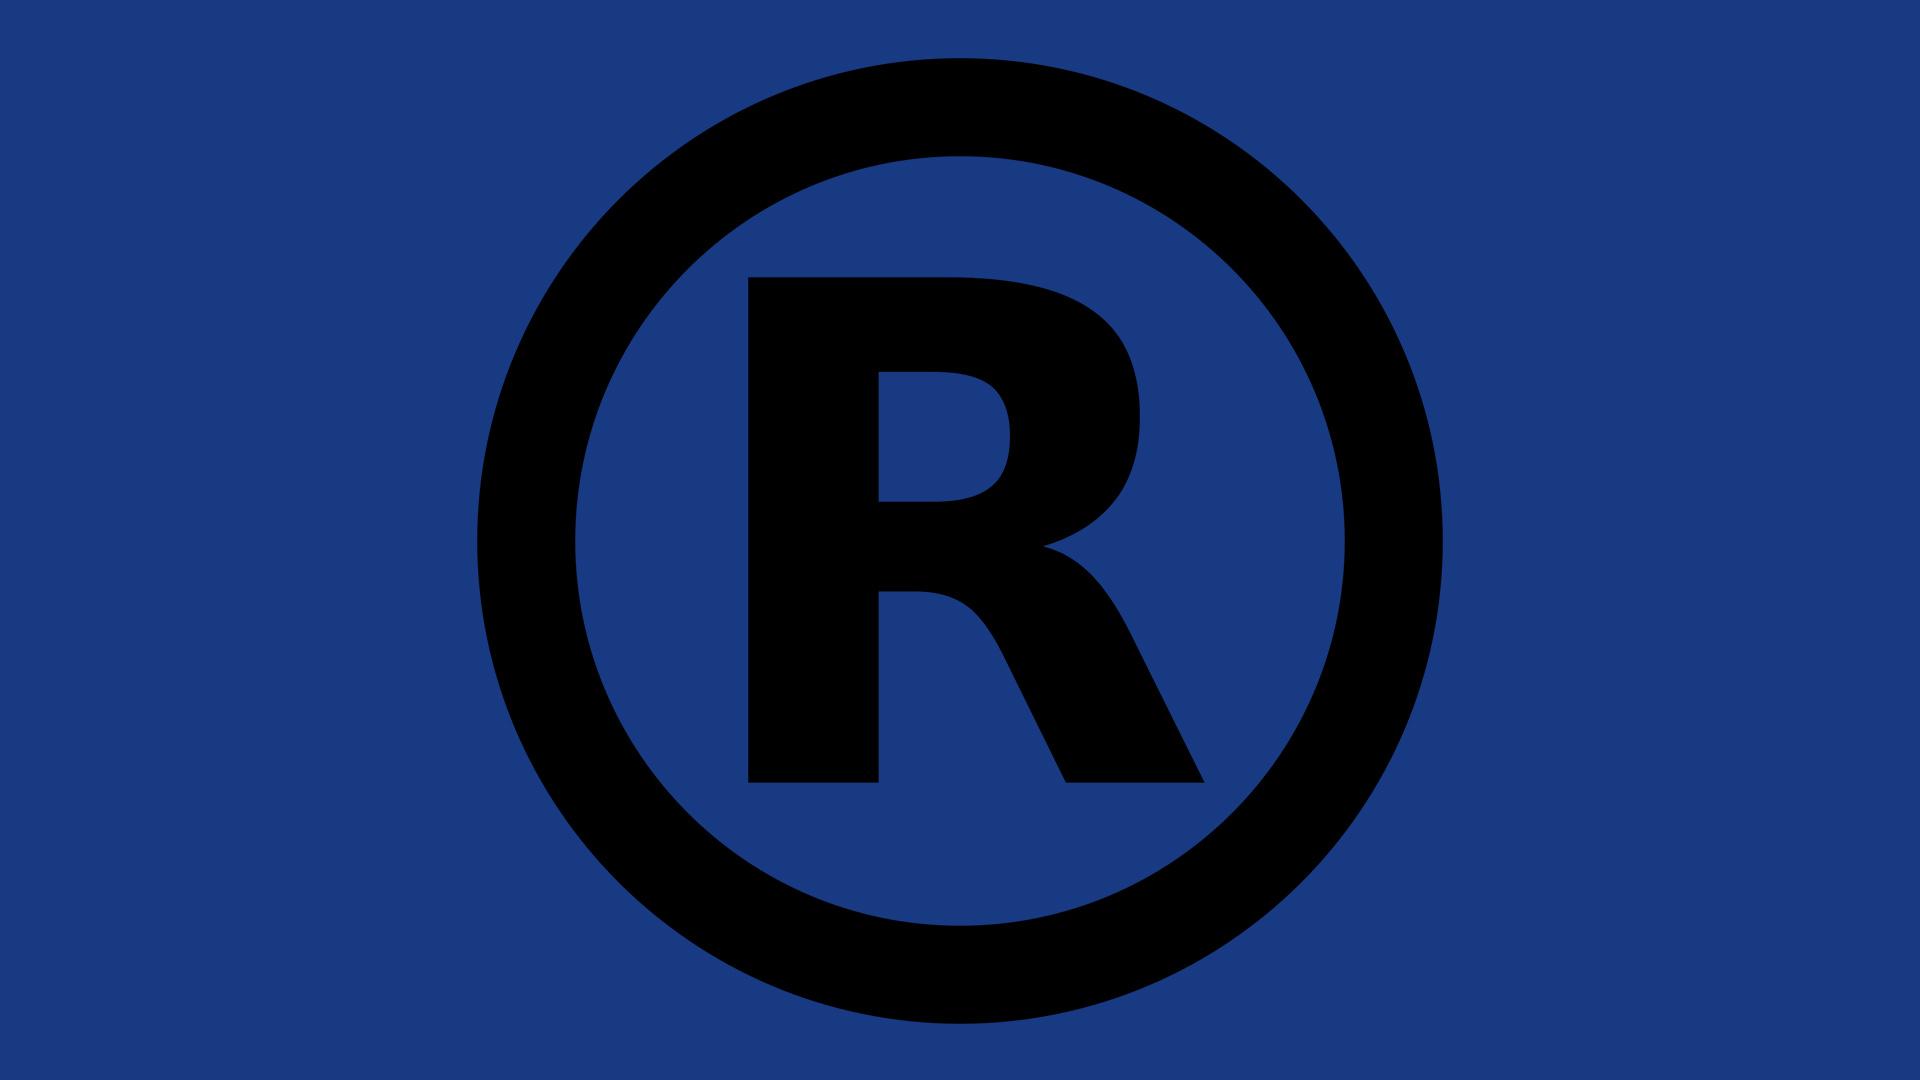 Multiple Trademark Infringement Complaints Resolved